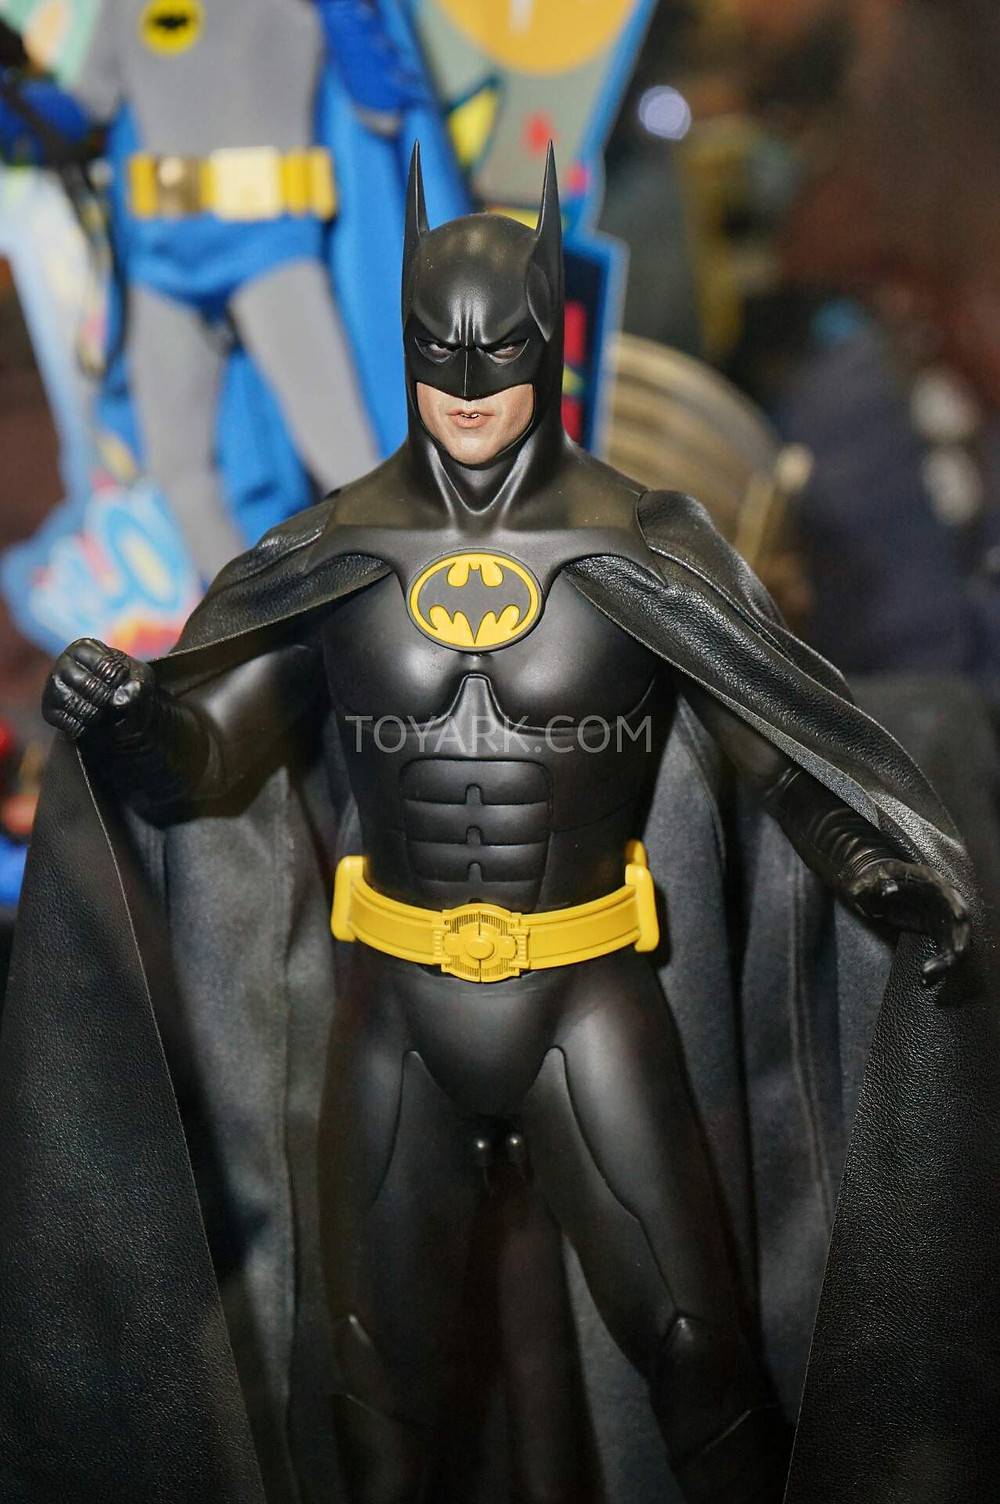 SDCC2015-Hot-Toys-Batman-Line-003.jpg